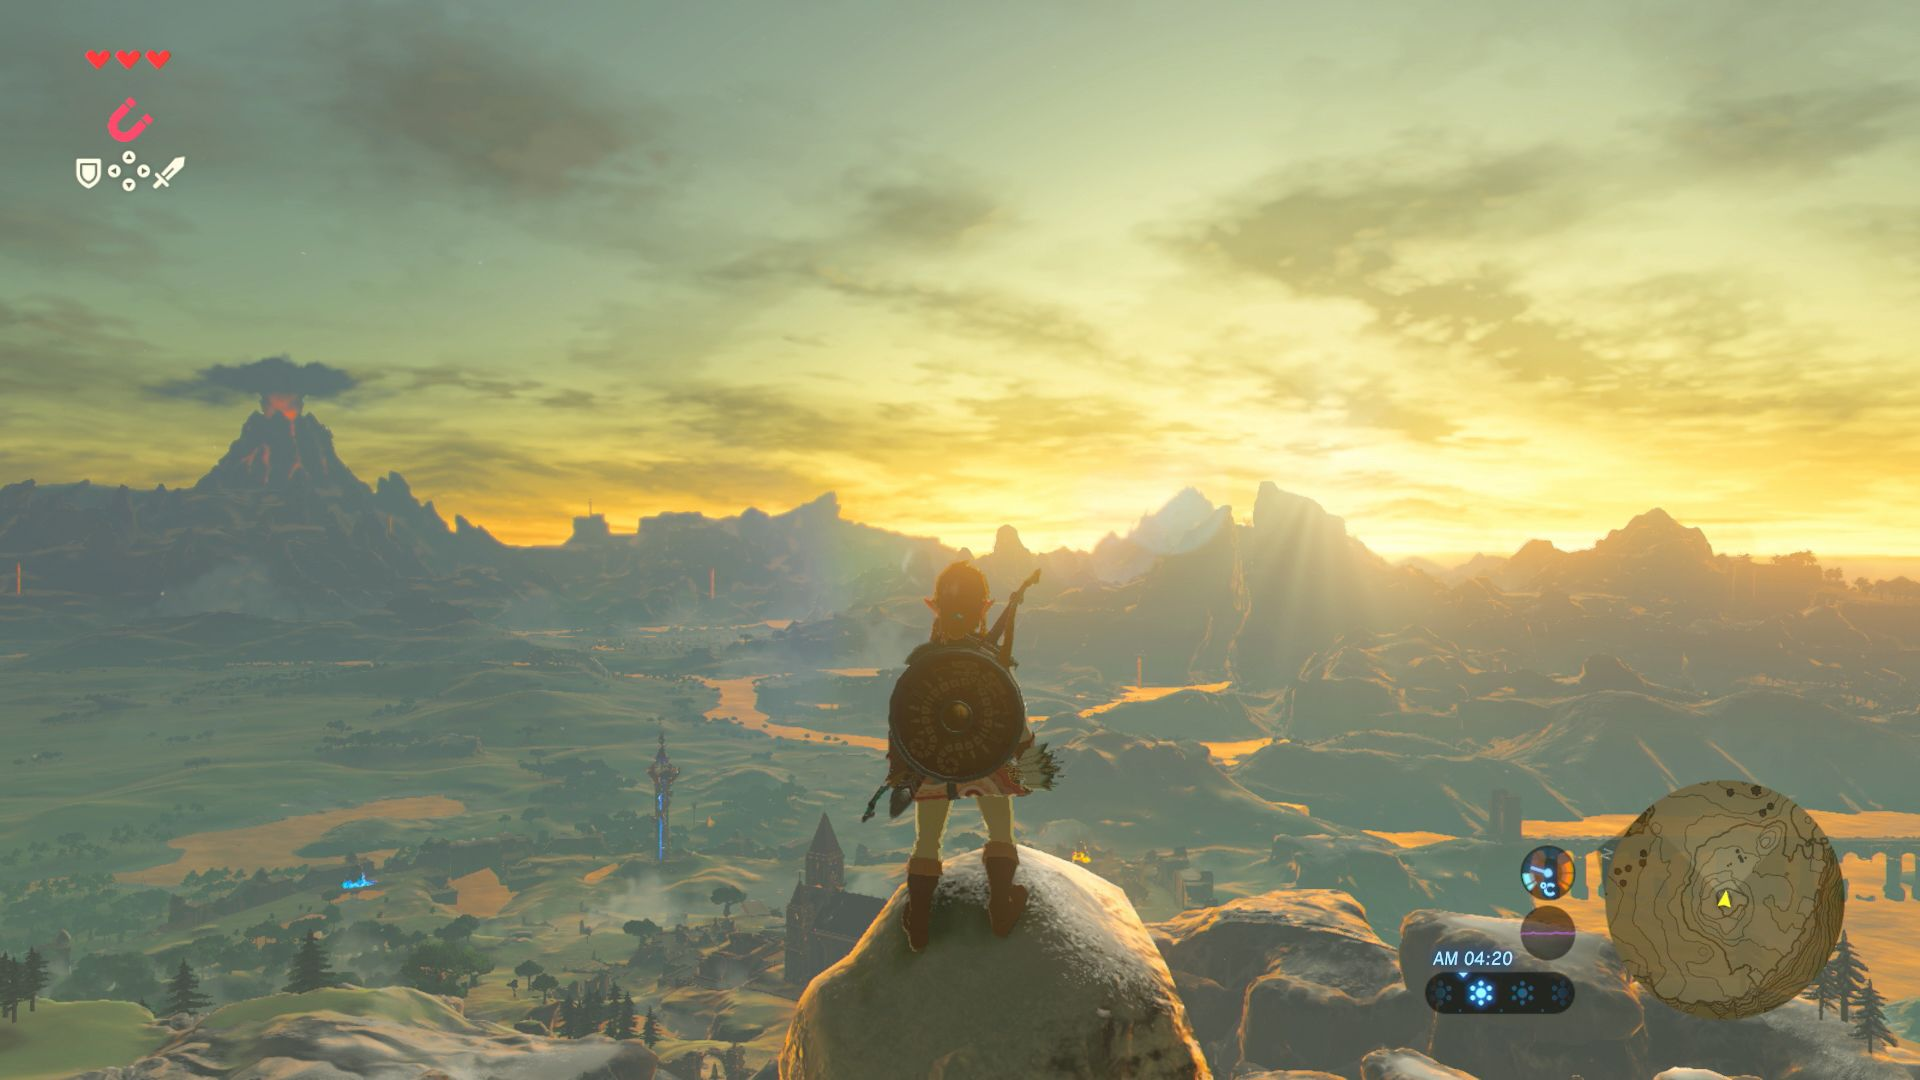 The Legend of Zelda: Breath of the Wild (2017) PC